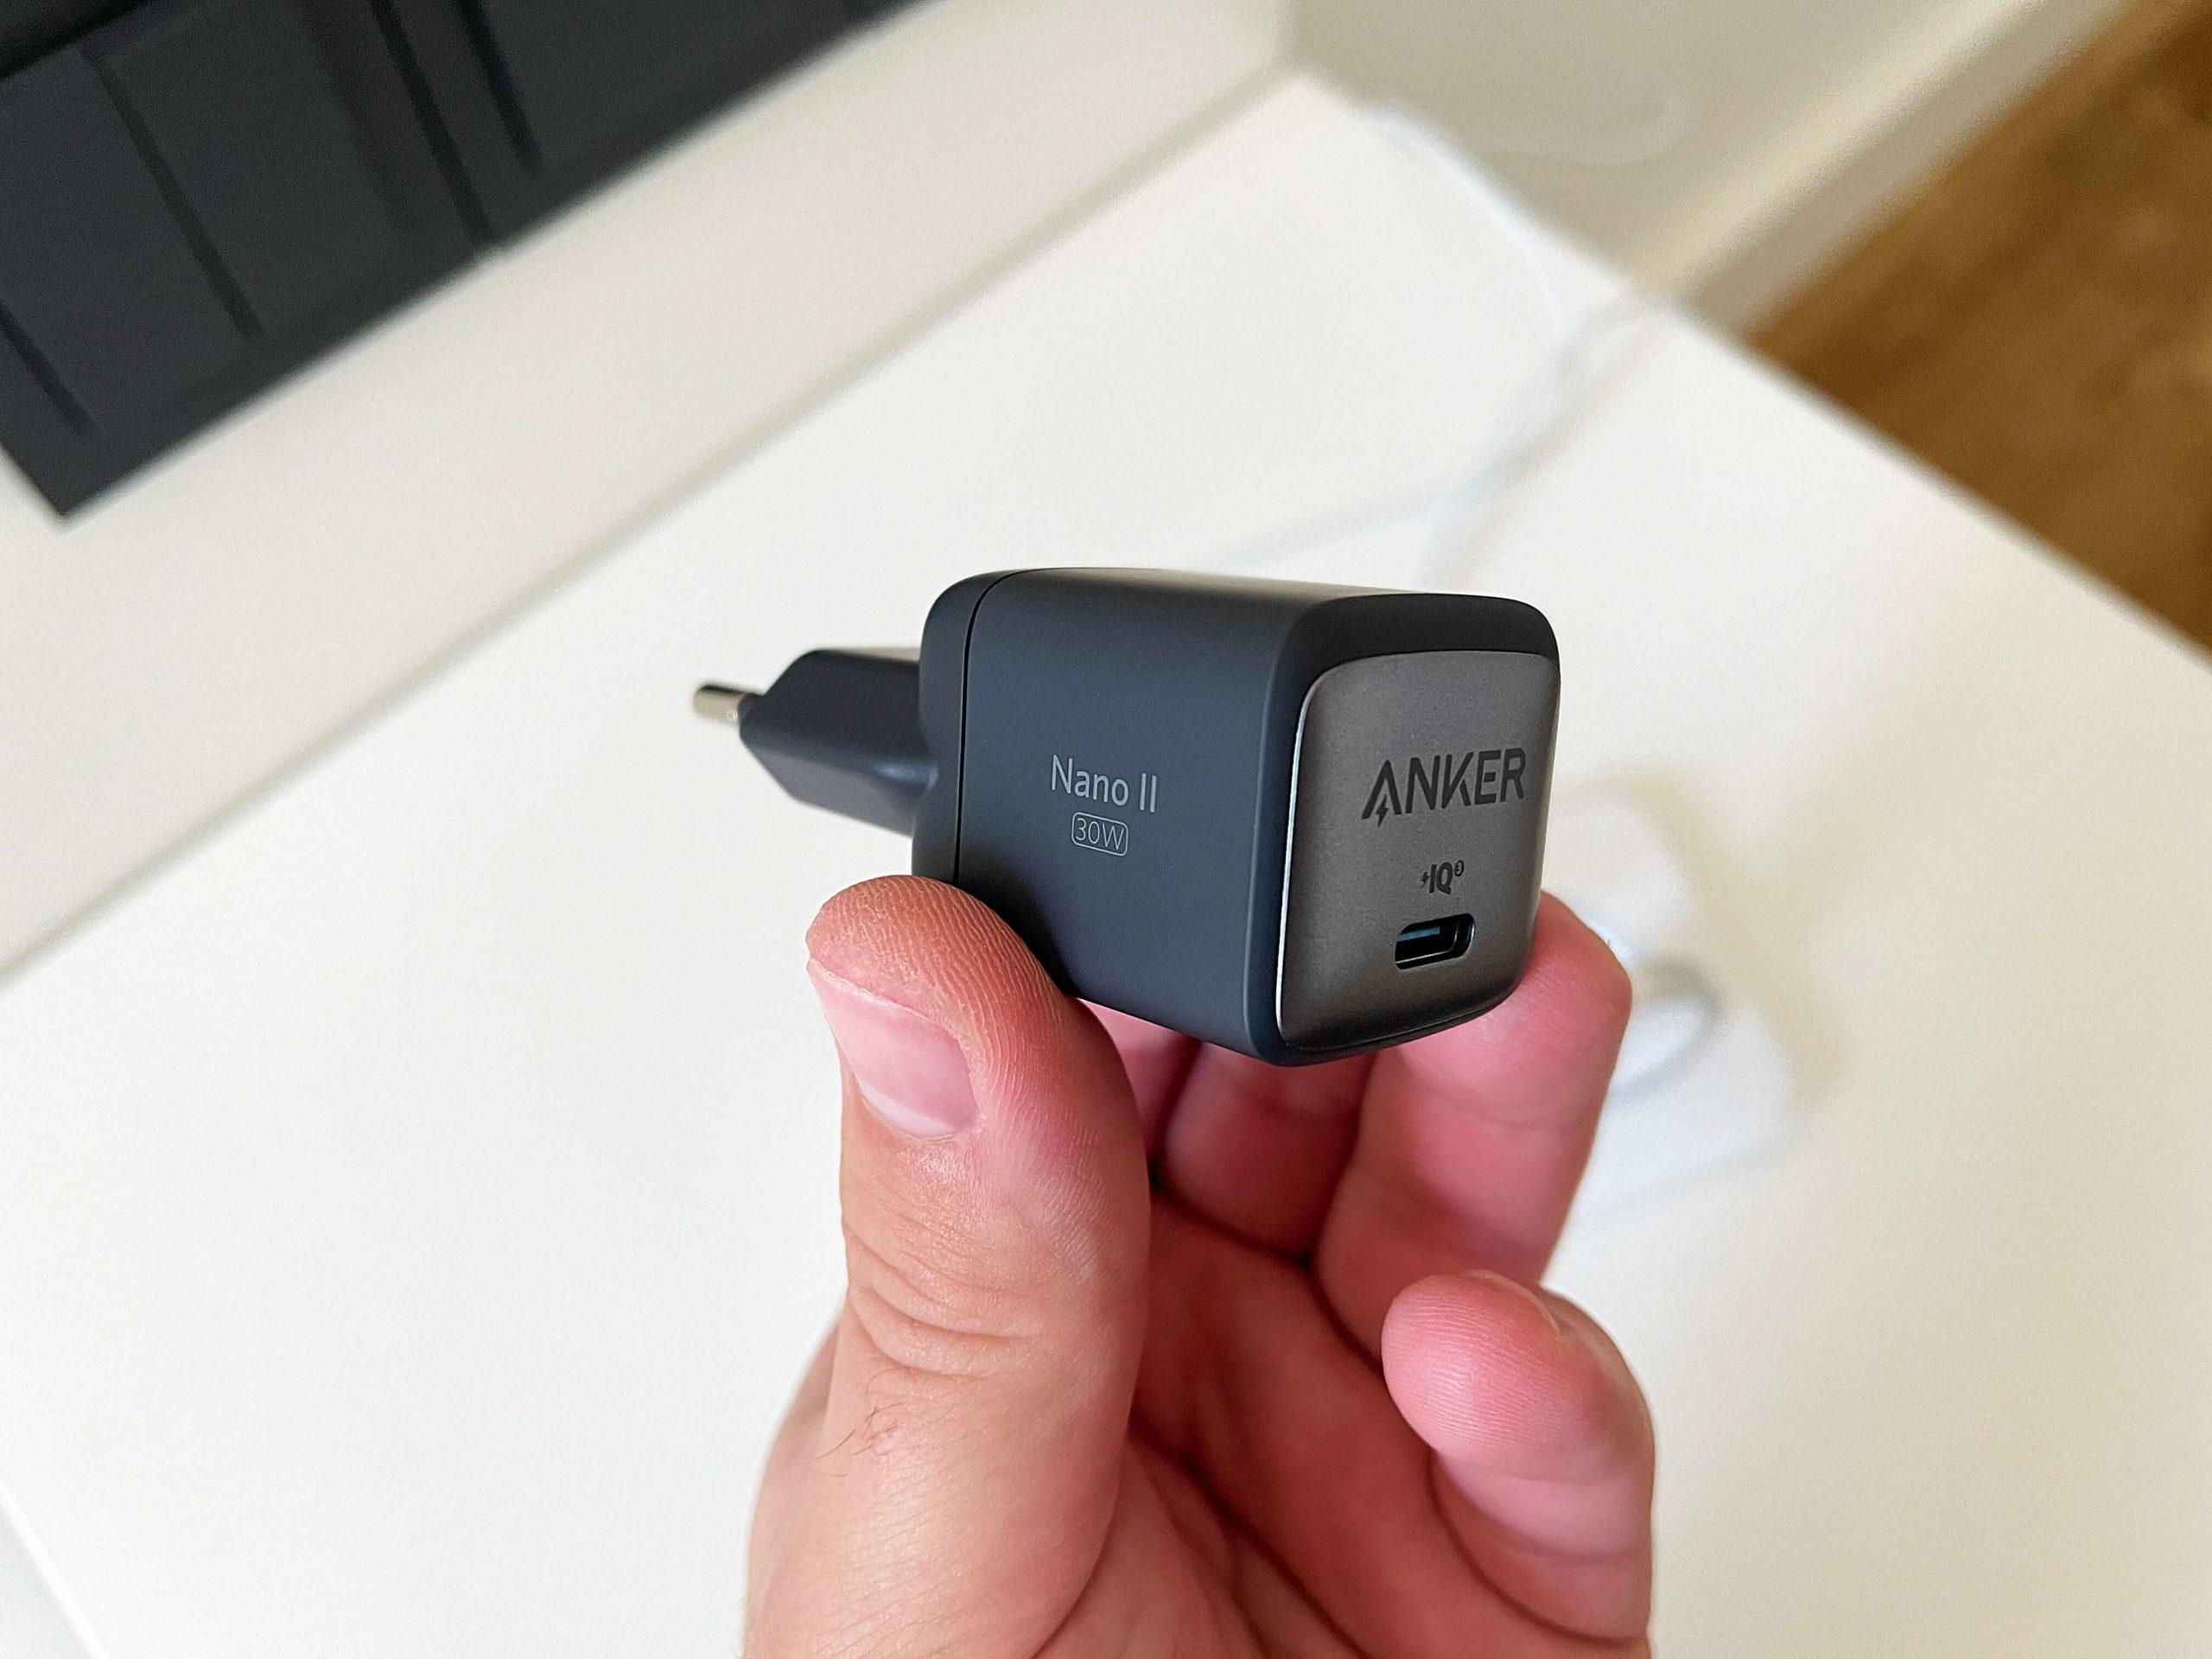 Anker-Nano-II-USB-C-Ladegeraet-von-Anker-30-Watt-im-Hosentaschenformat3-scaled Nano II USB-C-Ladegerät von Anker - 30 Watt im Hosentaschenformat